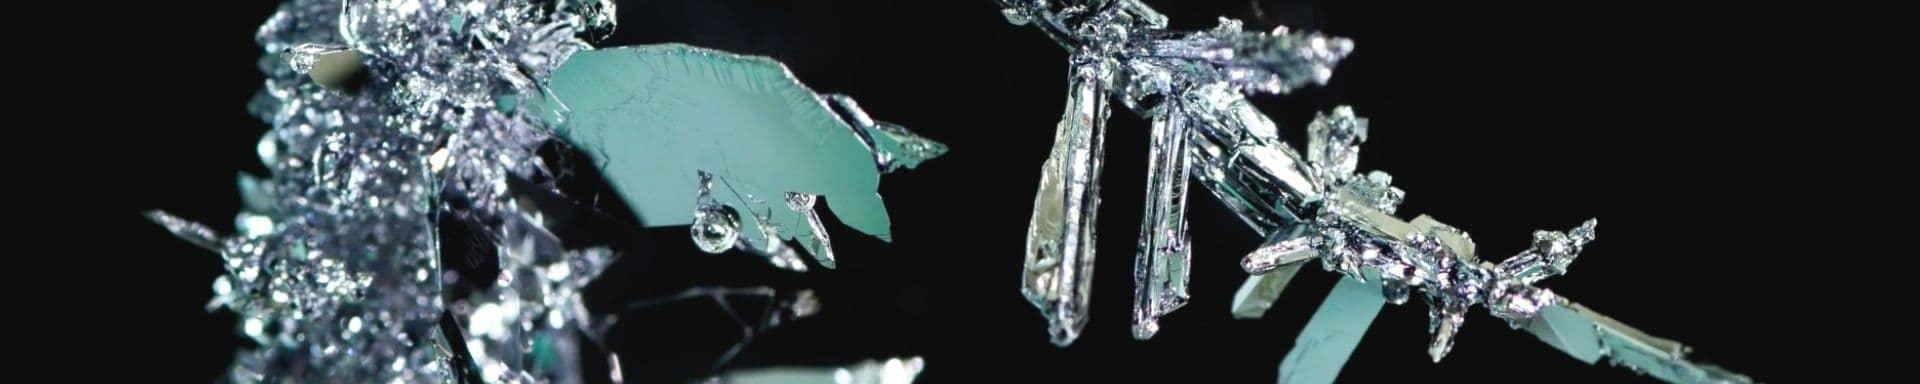 Timelapse do nascimento de cristais metálicos